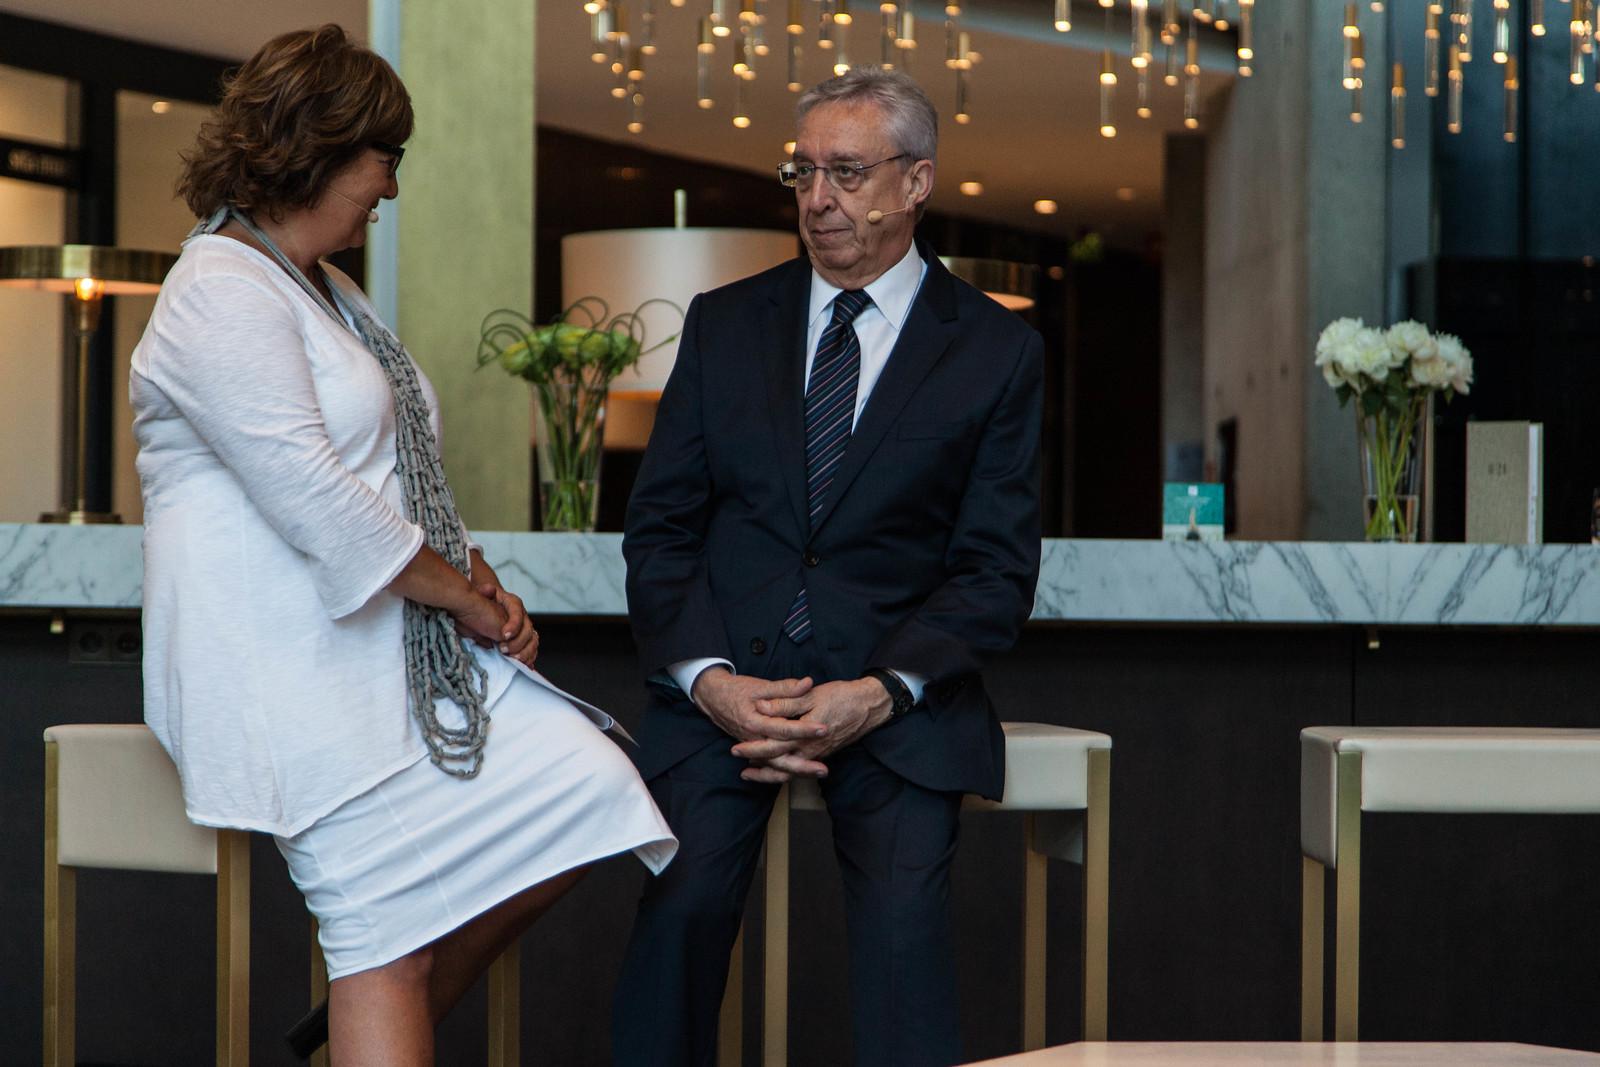 dc., 05/07/2017 - 19:35 - Hotel Rey Juan Carlos - 45